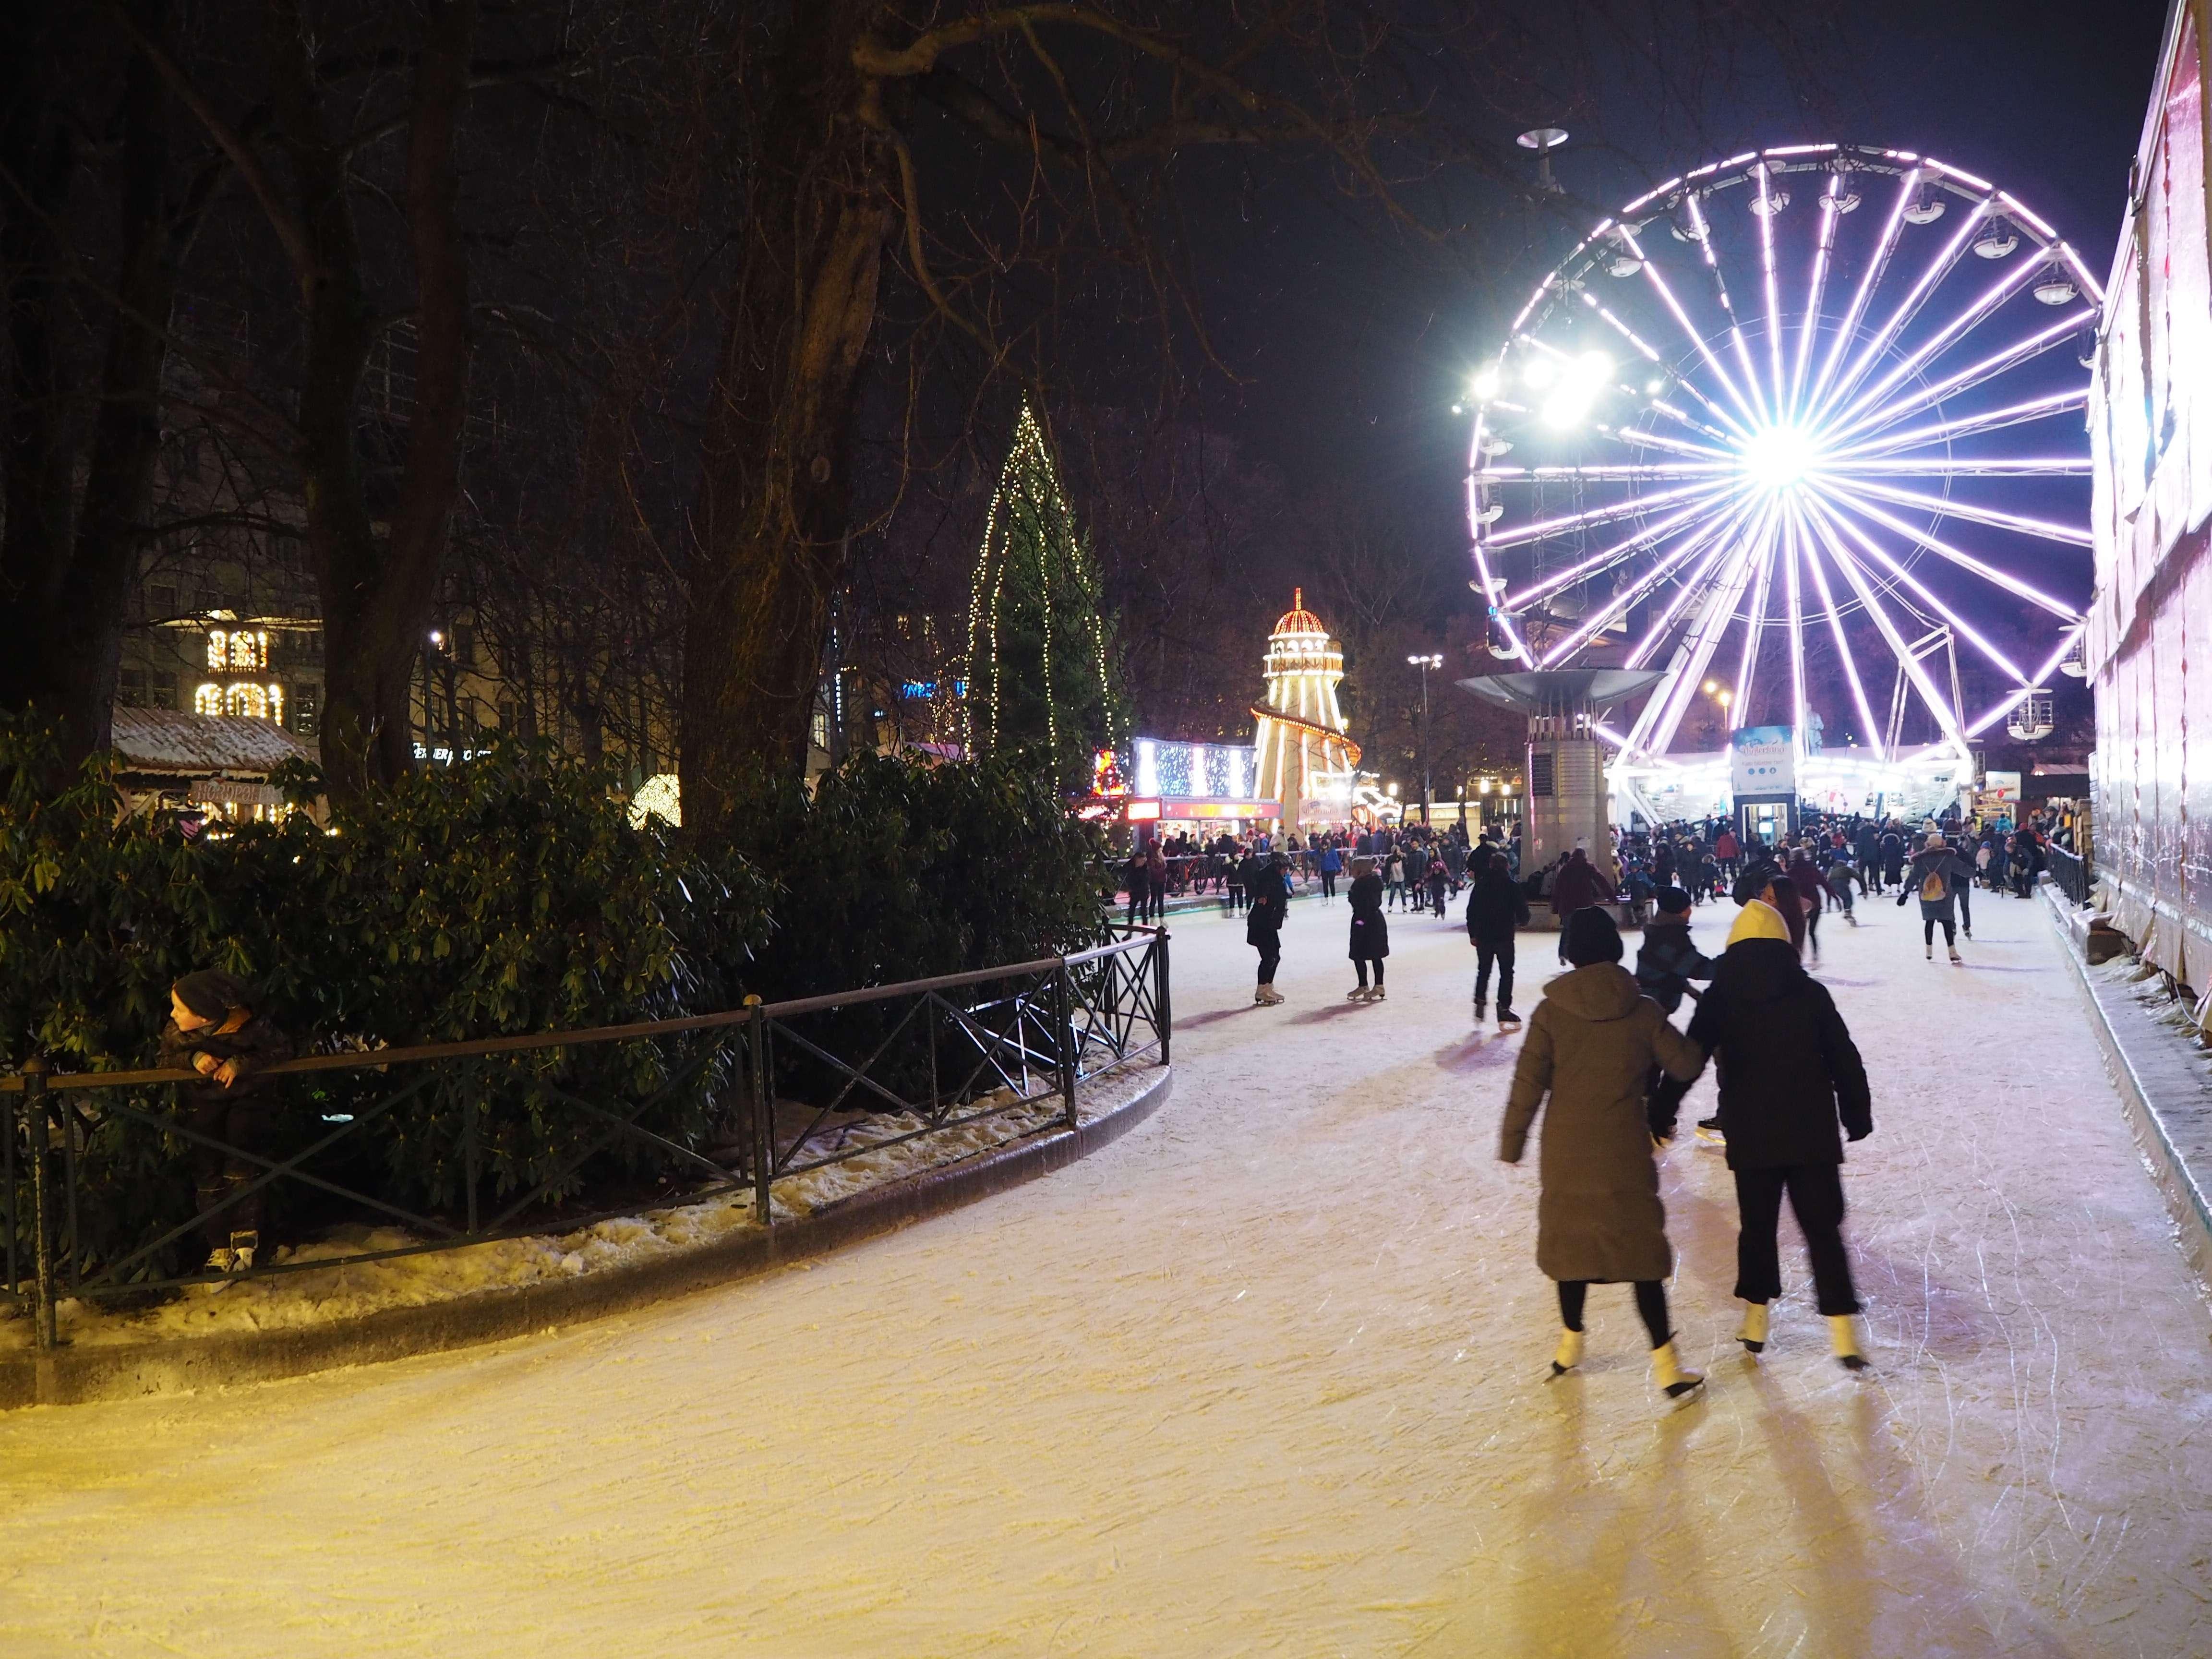 Oslo Christmas Market